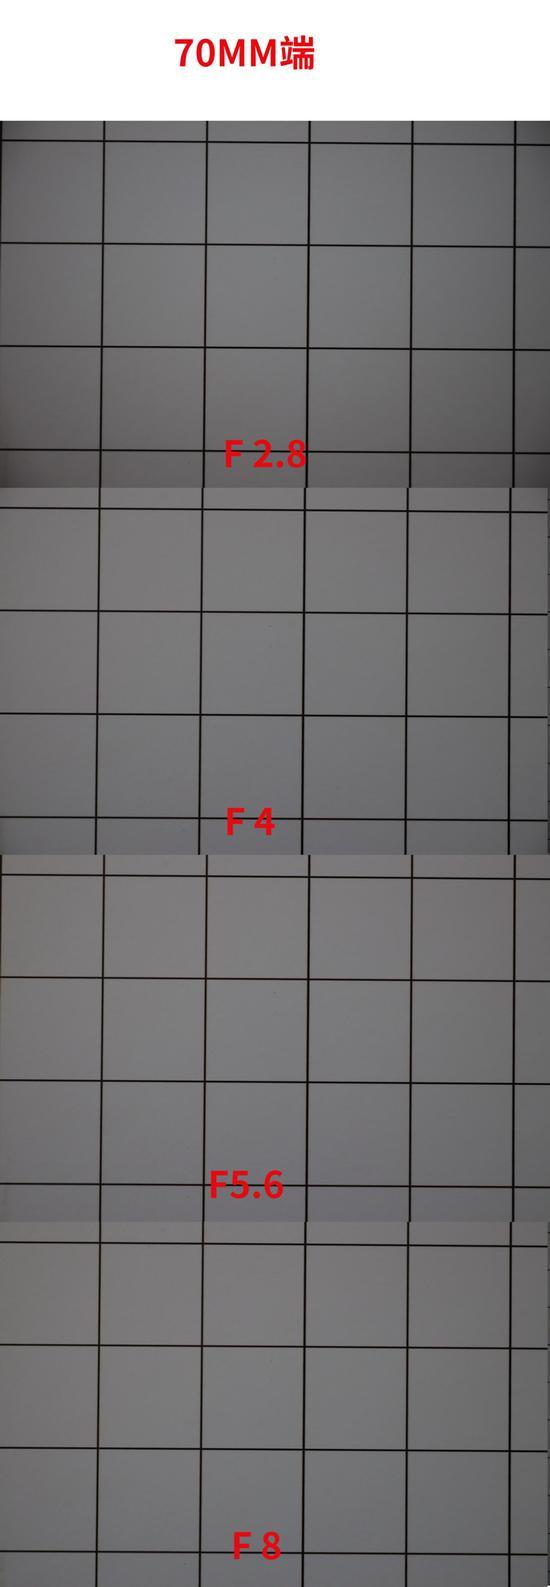 ag视讯6万流水反多少_中国太保拟发GDR并在伦交所上市 资金用于国际化布局